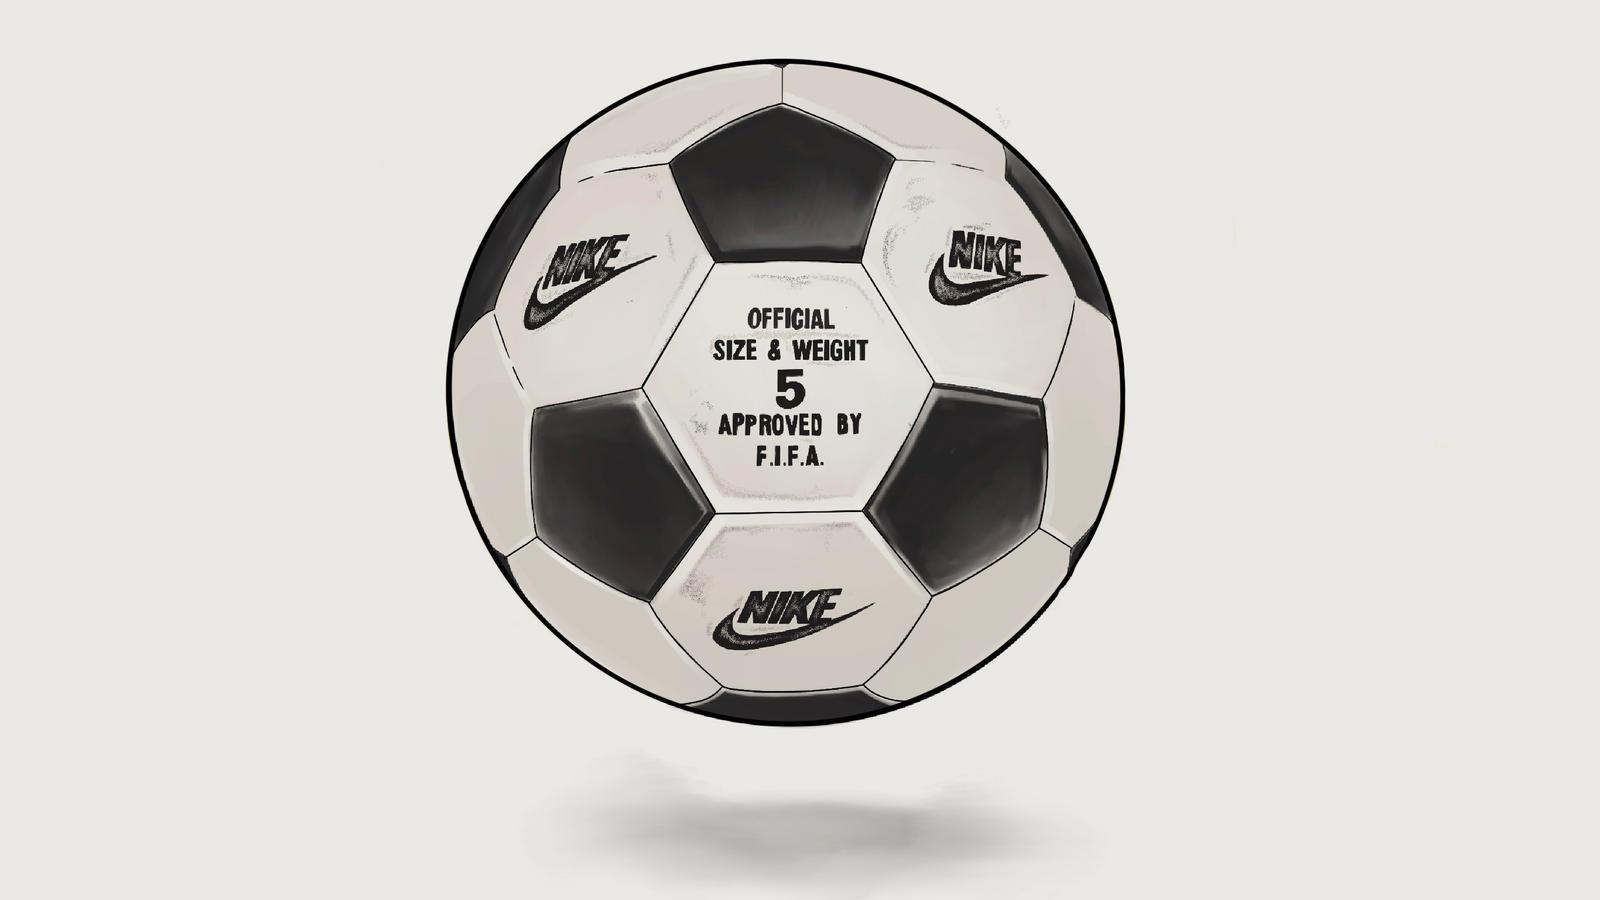 Nike Flight Ball 8